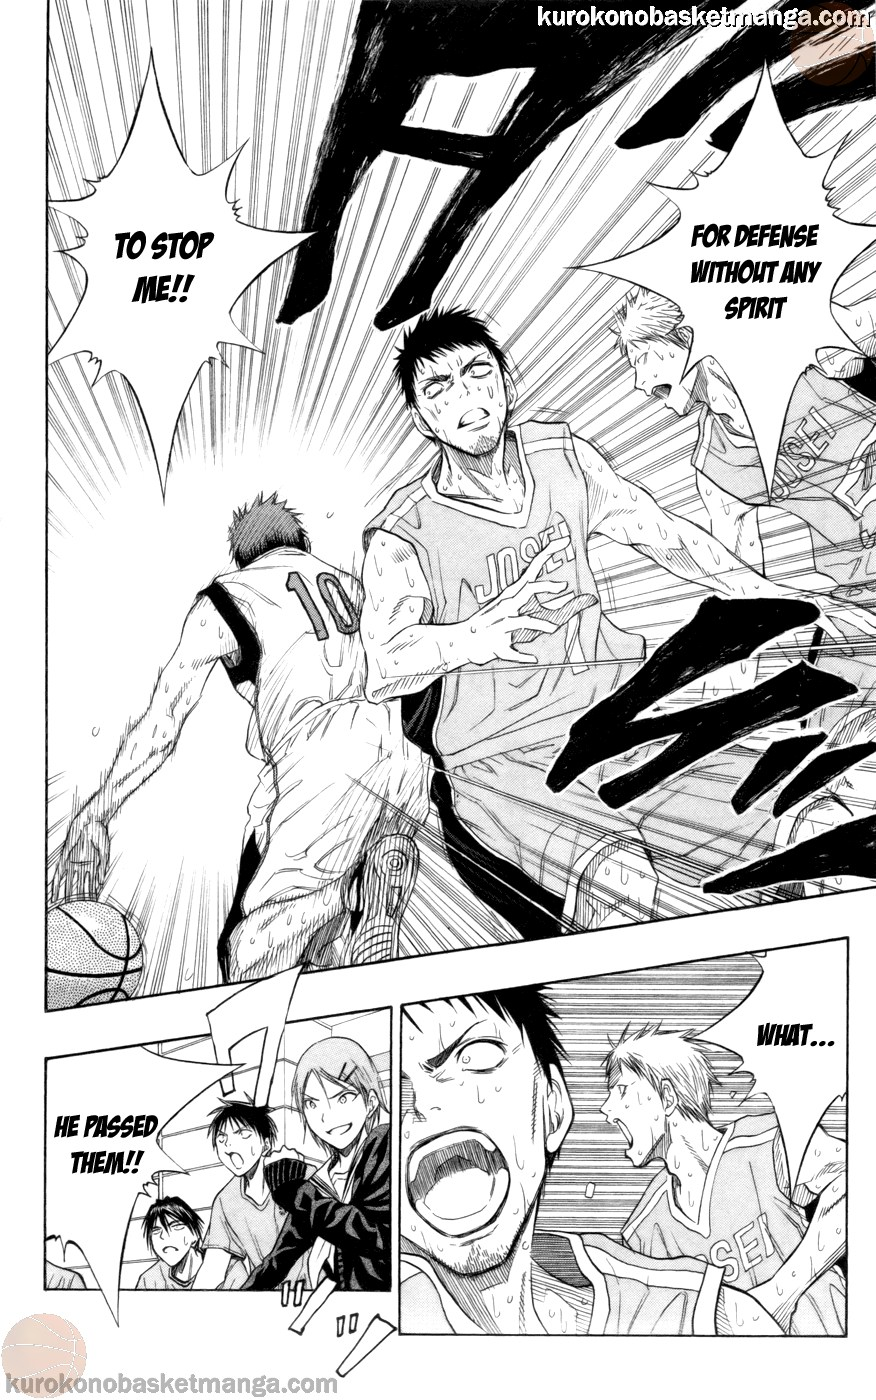 Kuroko no Basket Manga Chapter 83 - Image 10